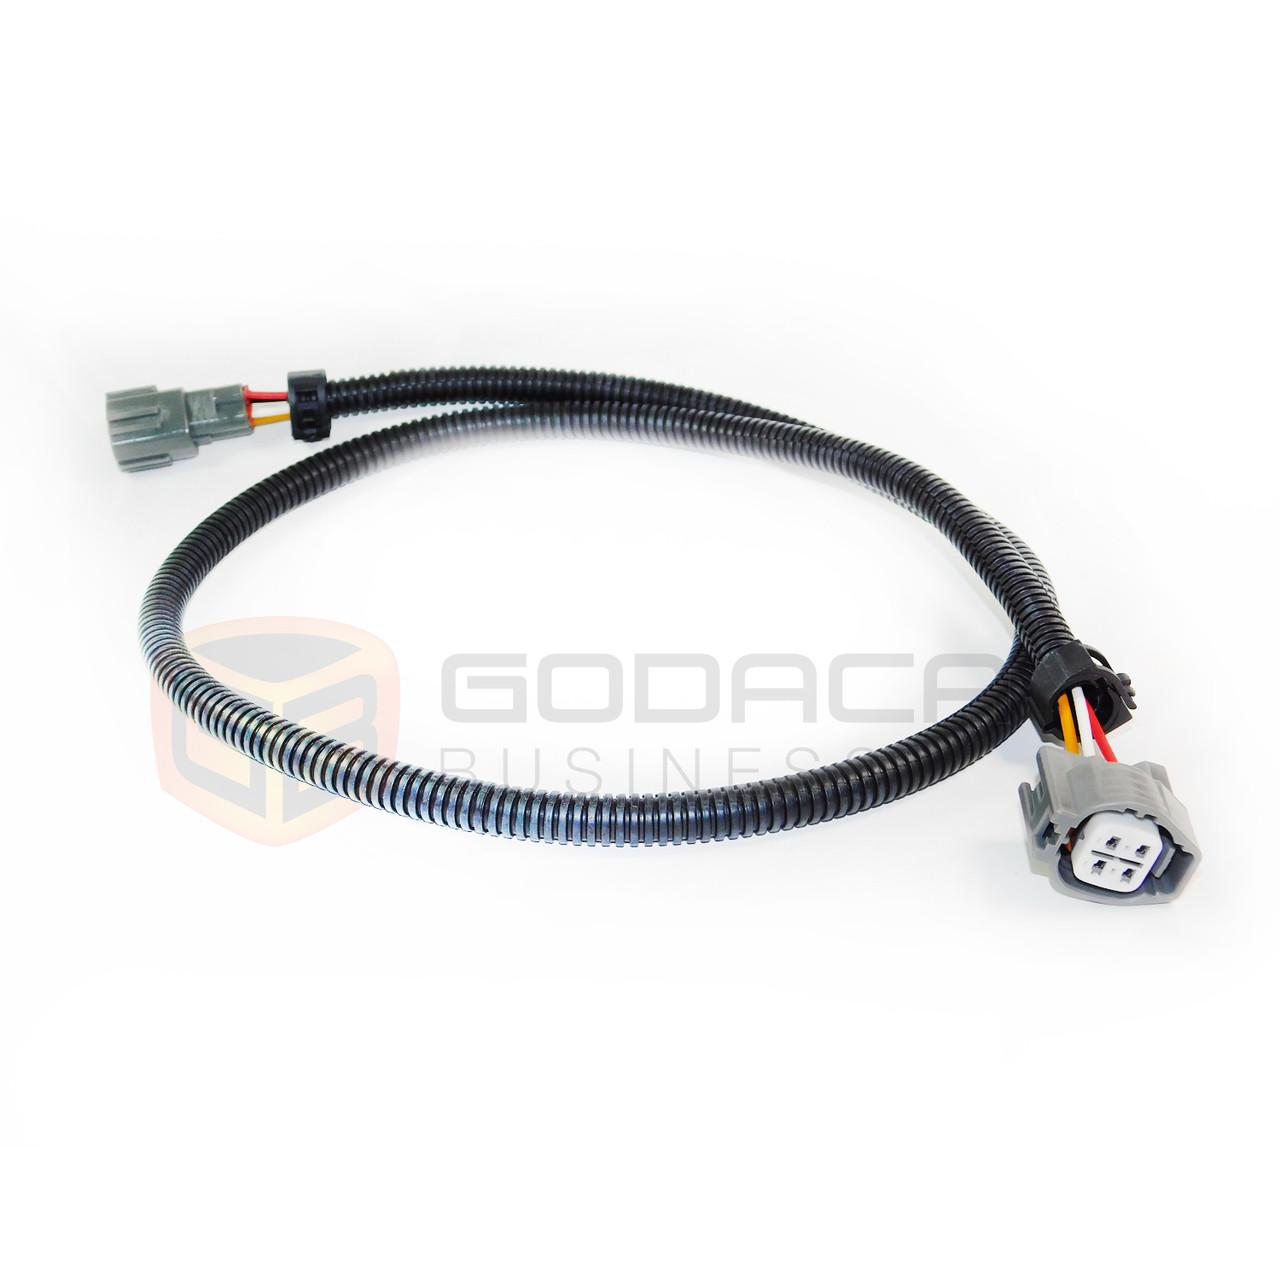 1x wiring harness extension for toyota o2 oxygen sensor 36 godaca llc  [ 1280 x 1280 Pixel ]